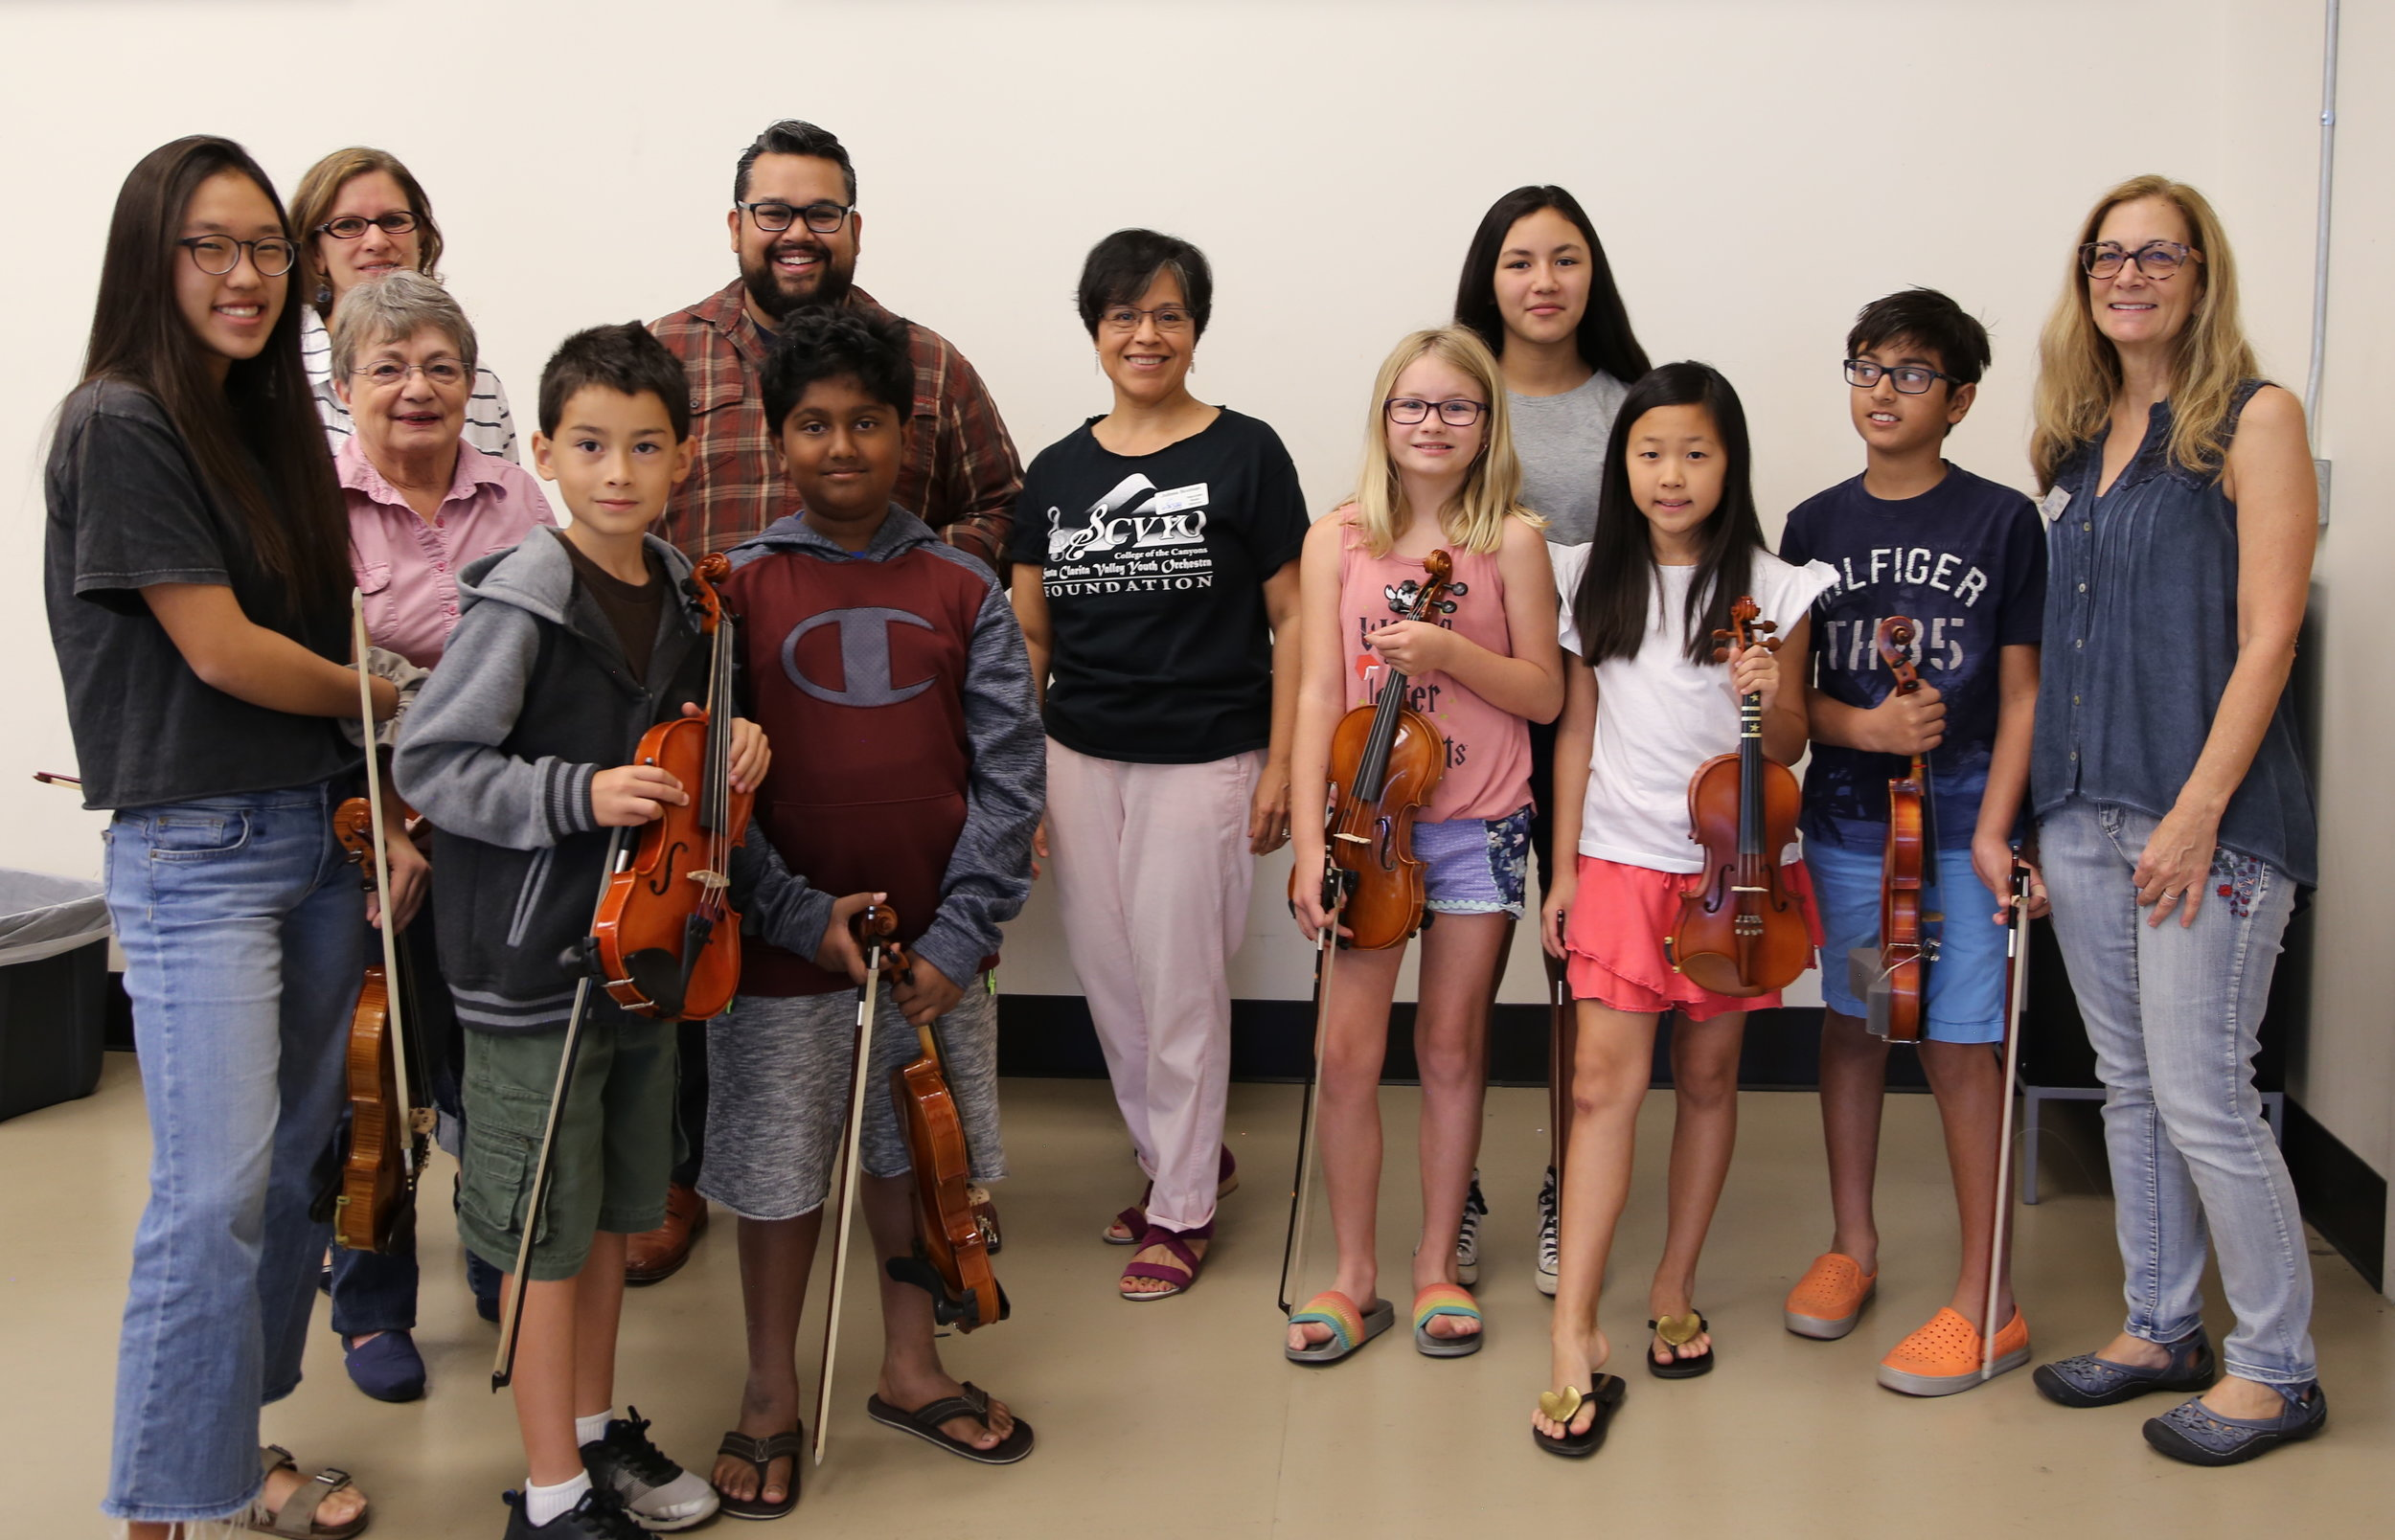 Vijay Gupta, LA Philharmonic Violinist with Julissa Bozman, SCVYO Associated Artistic Director and members of Prelude Strings